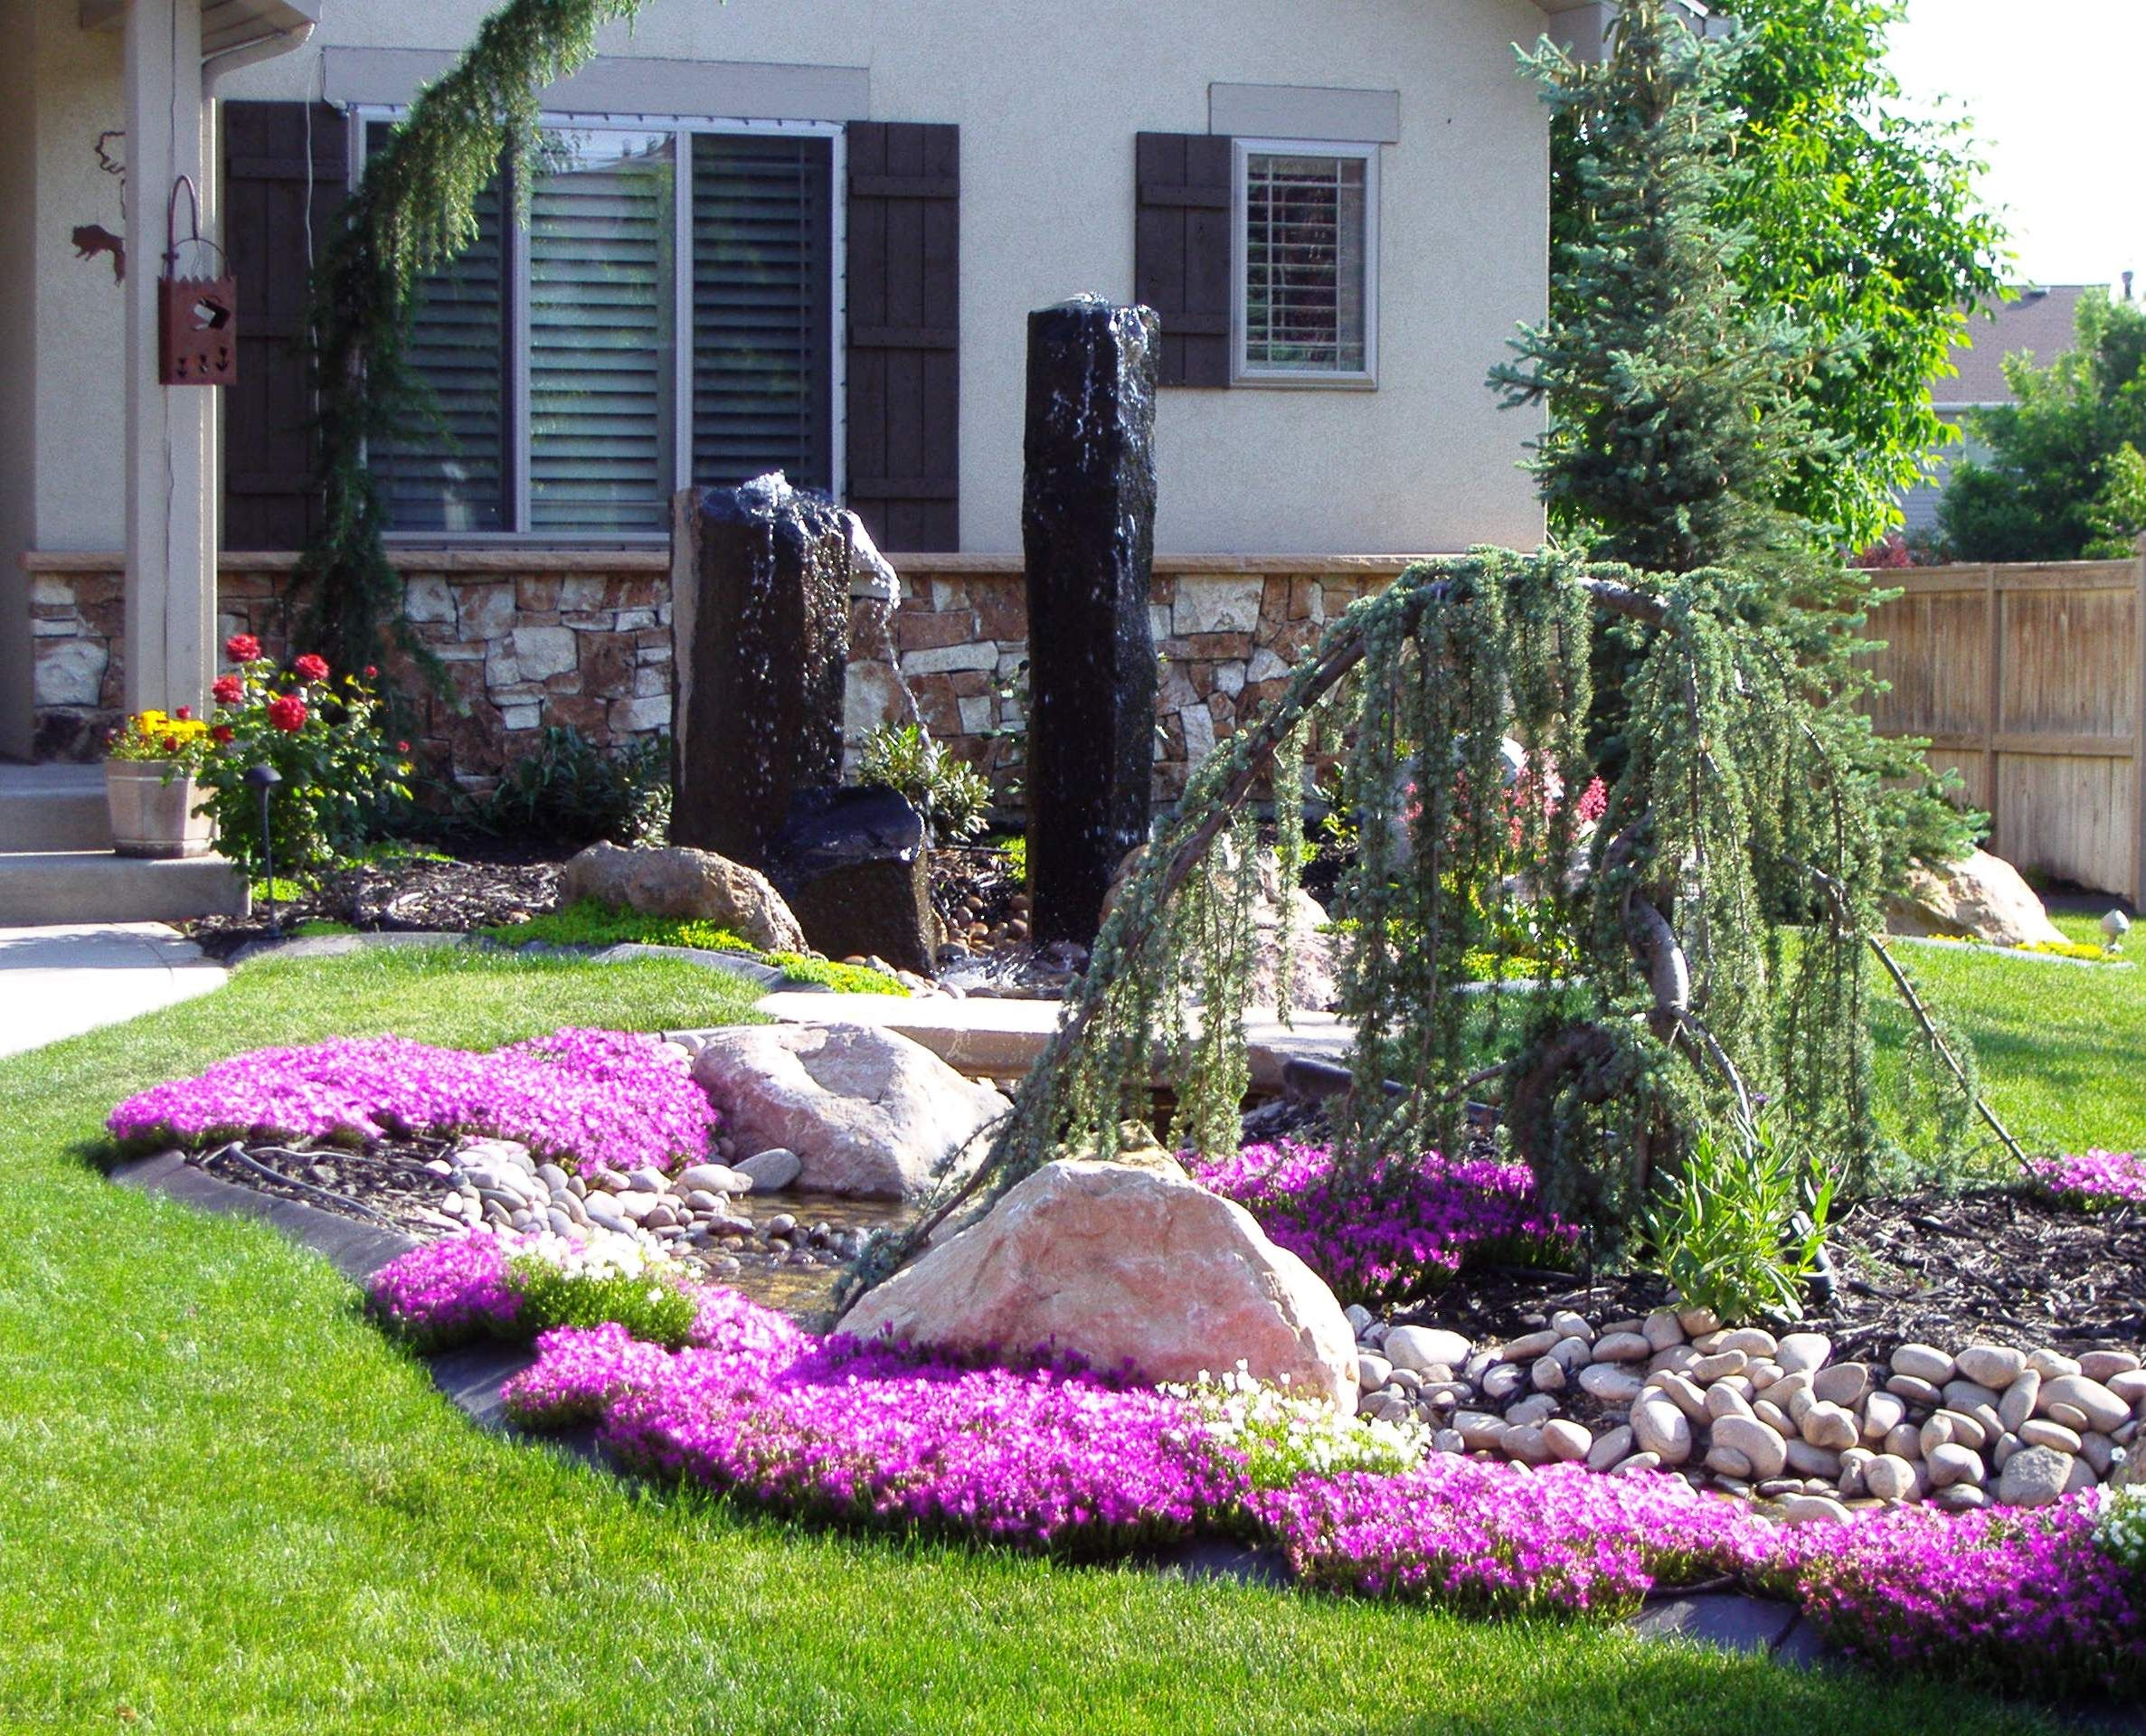 OLYMPUS DIGITAL CAMERA  Front yard garden design, Front yard